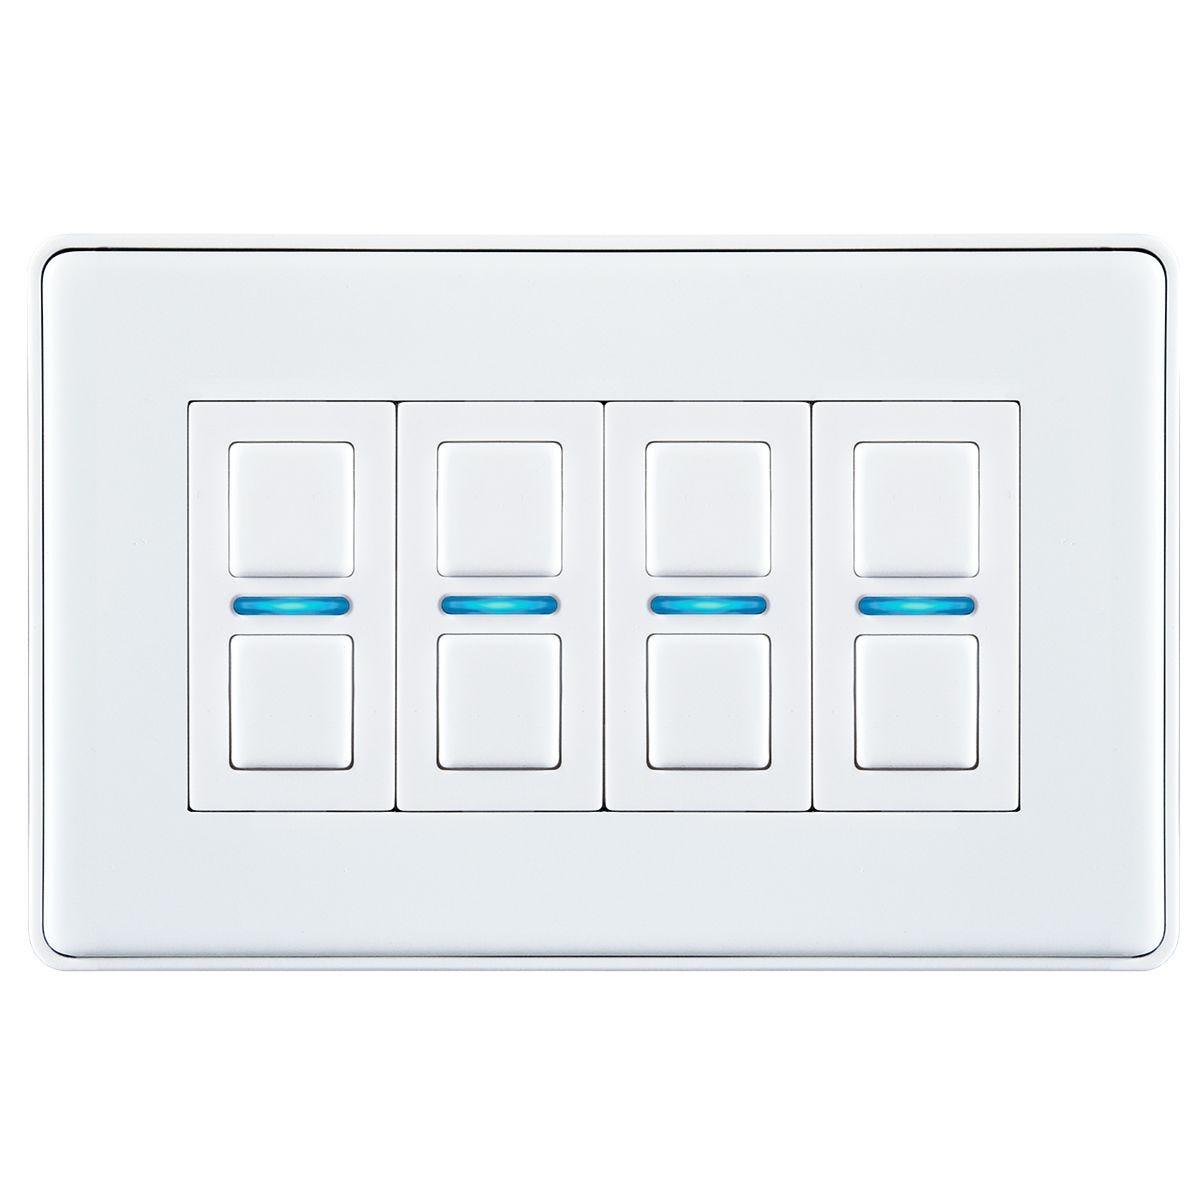 Lightwave Smart Series Dimmer (4 Gang) - White Metal